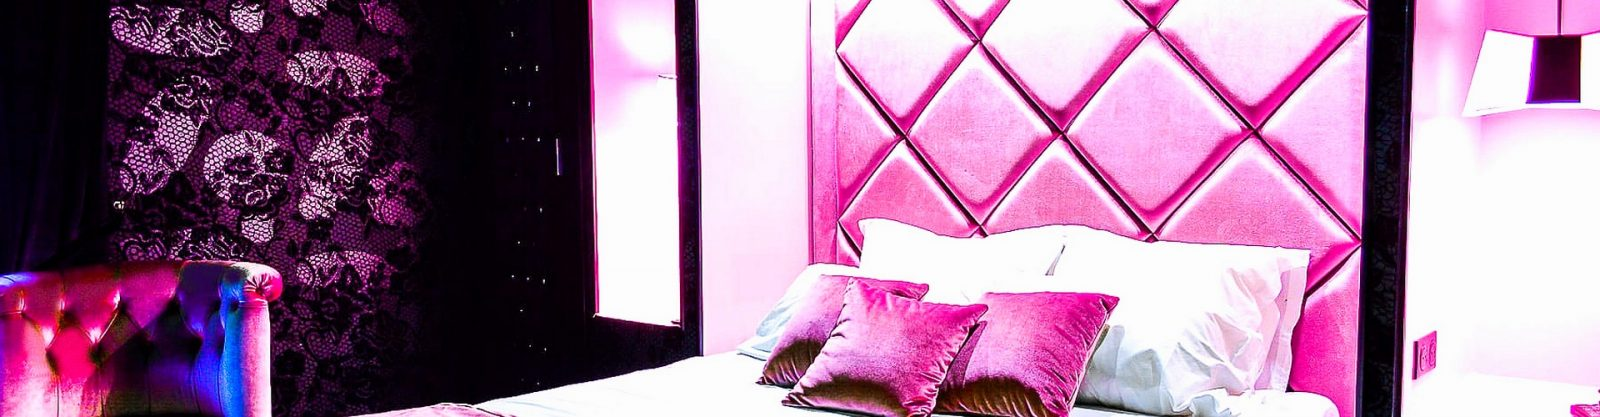 header hotel privatif paris love hotel couple